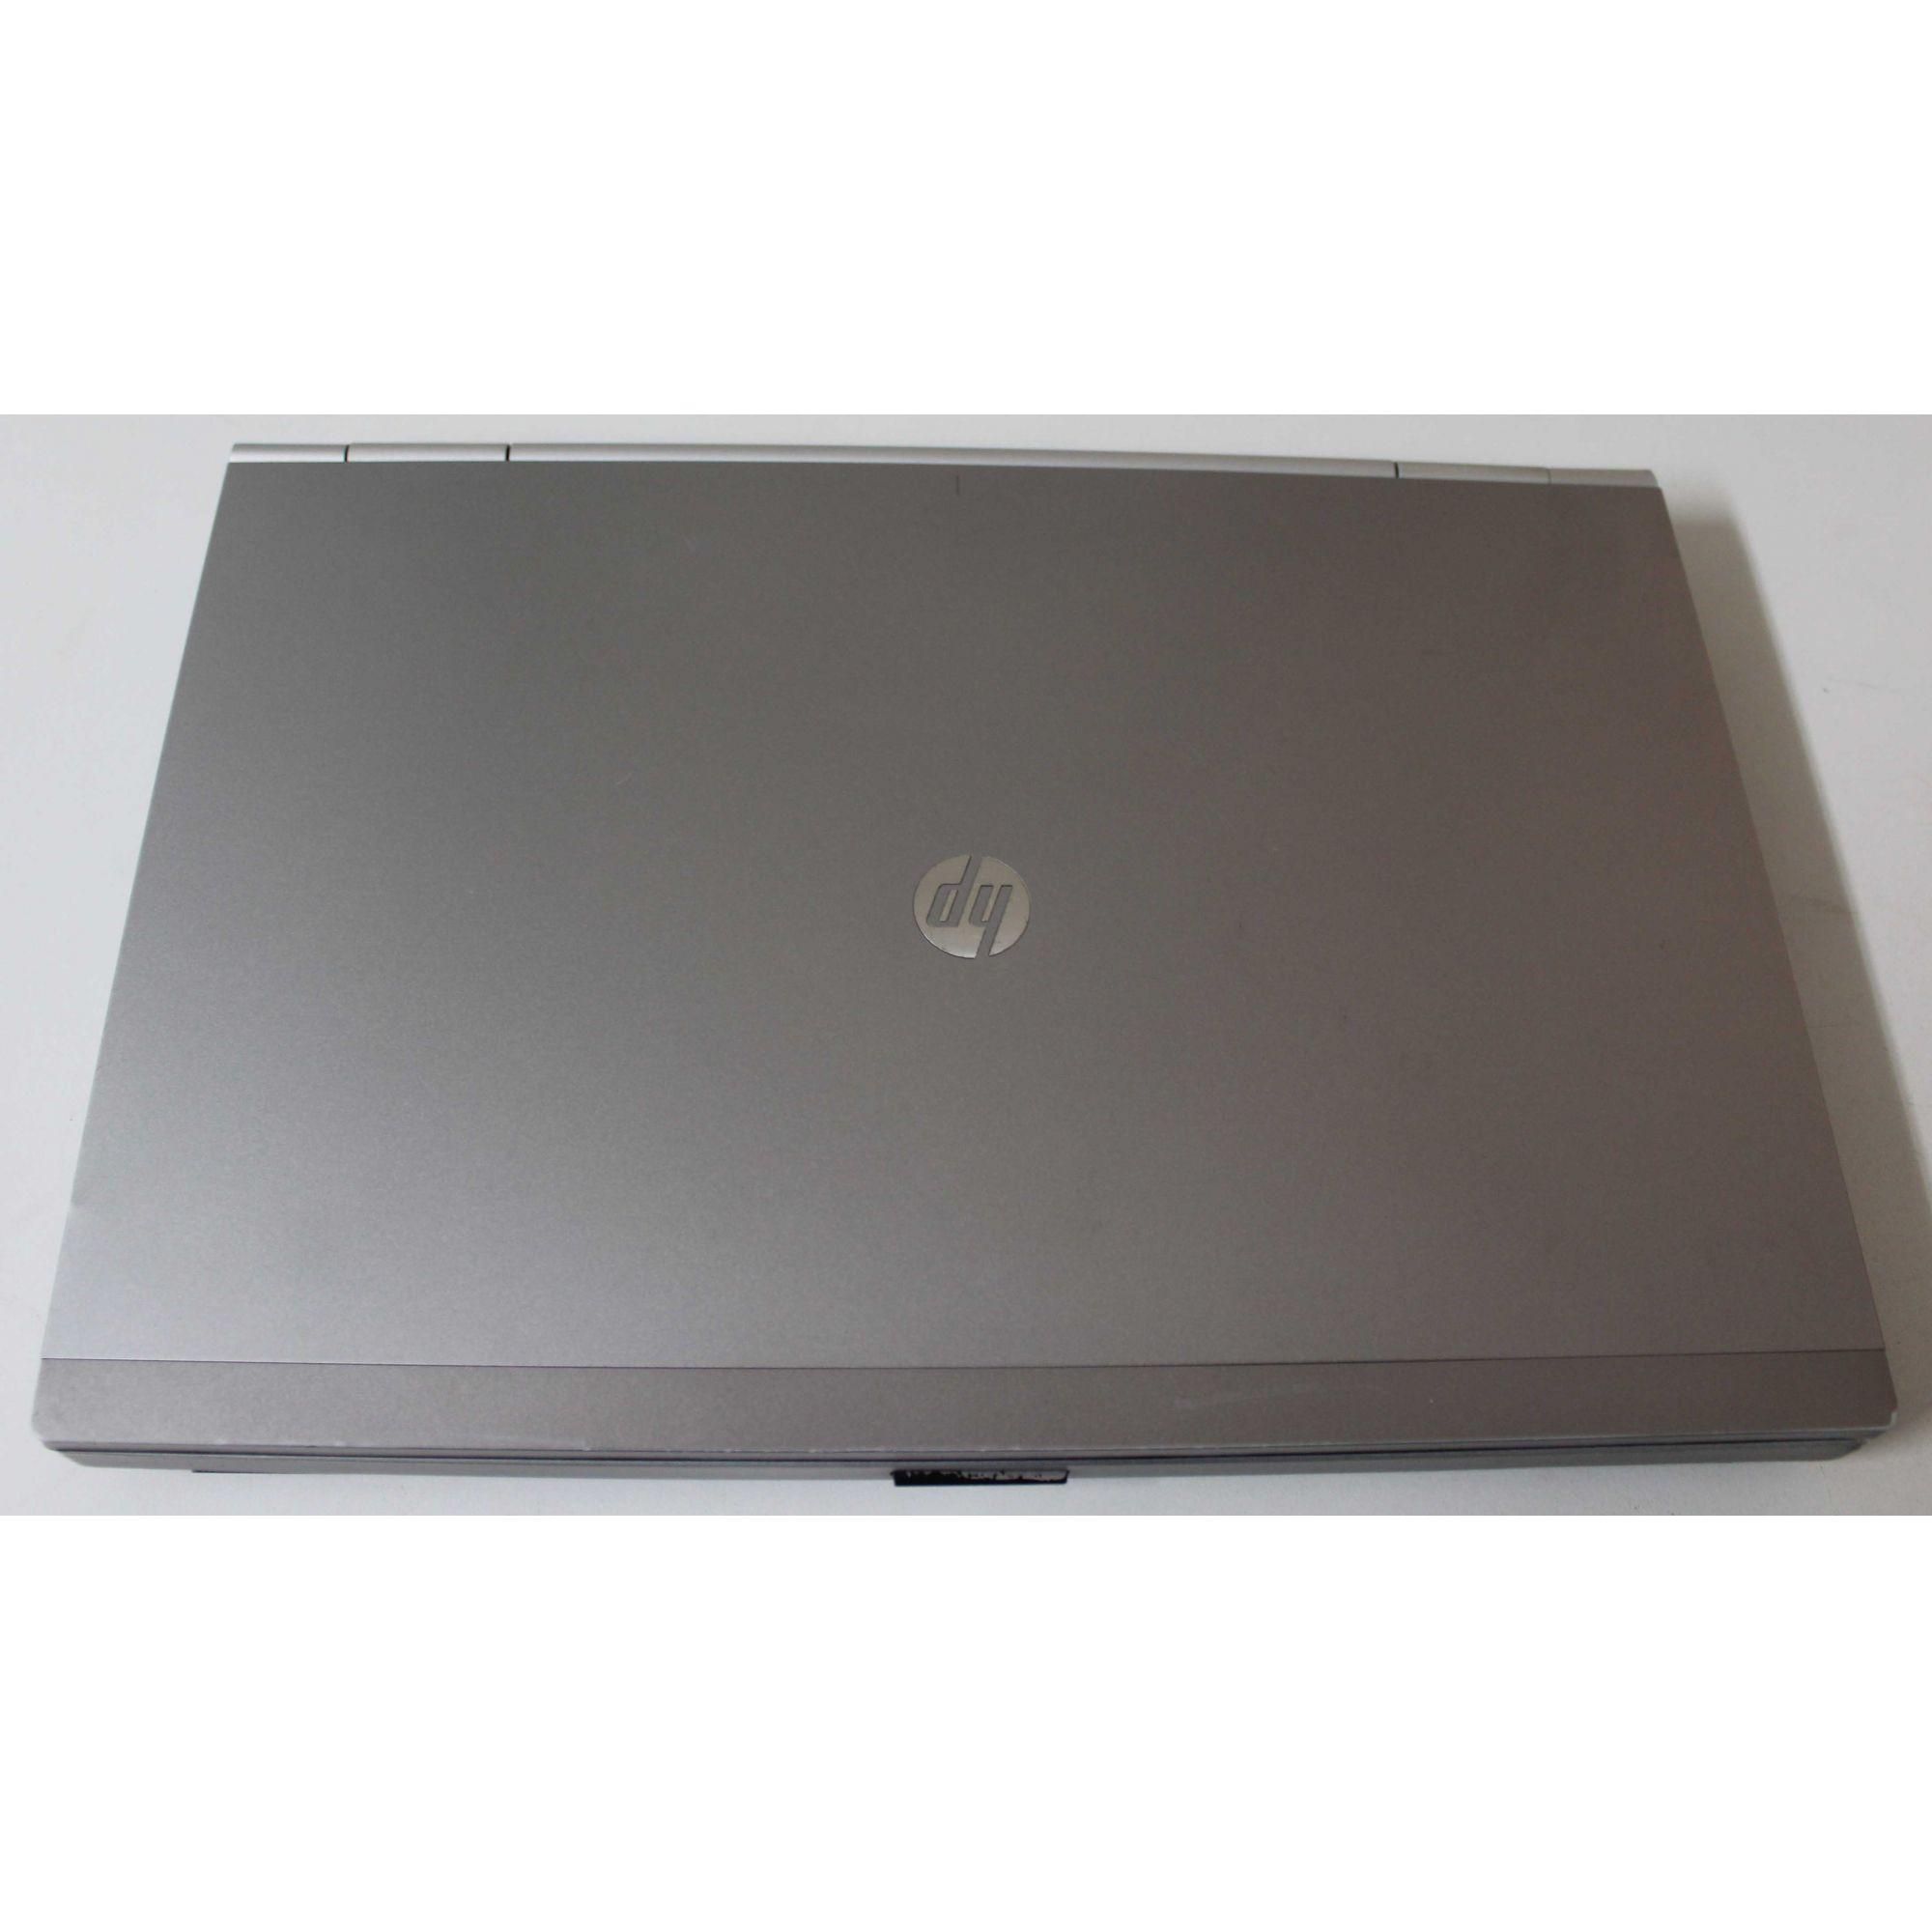 "Notebook HP Elitebook 8460p 14"" Intel Core i5 2.5GHz 4GB HD-250GB"